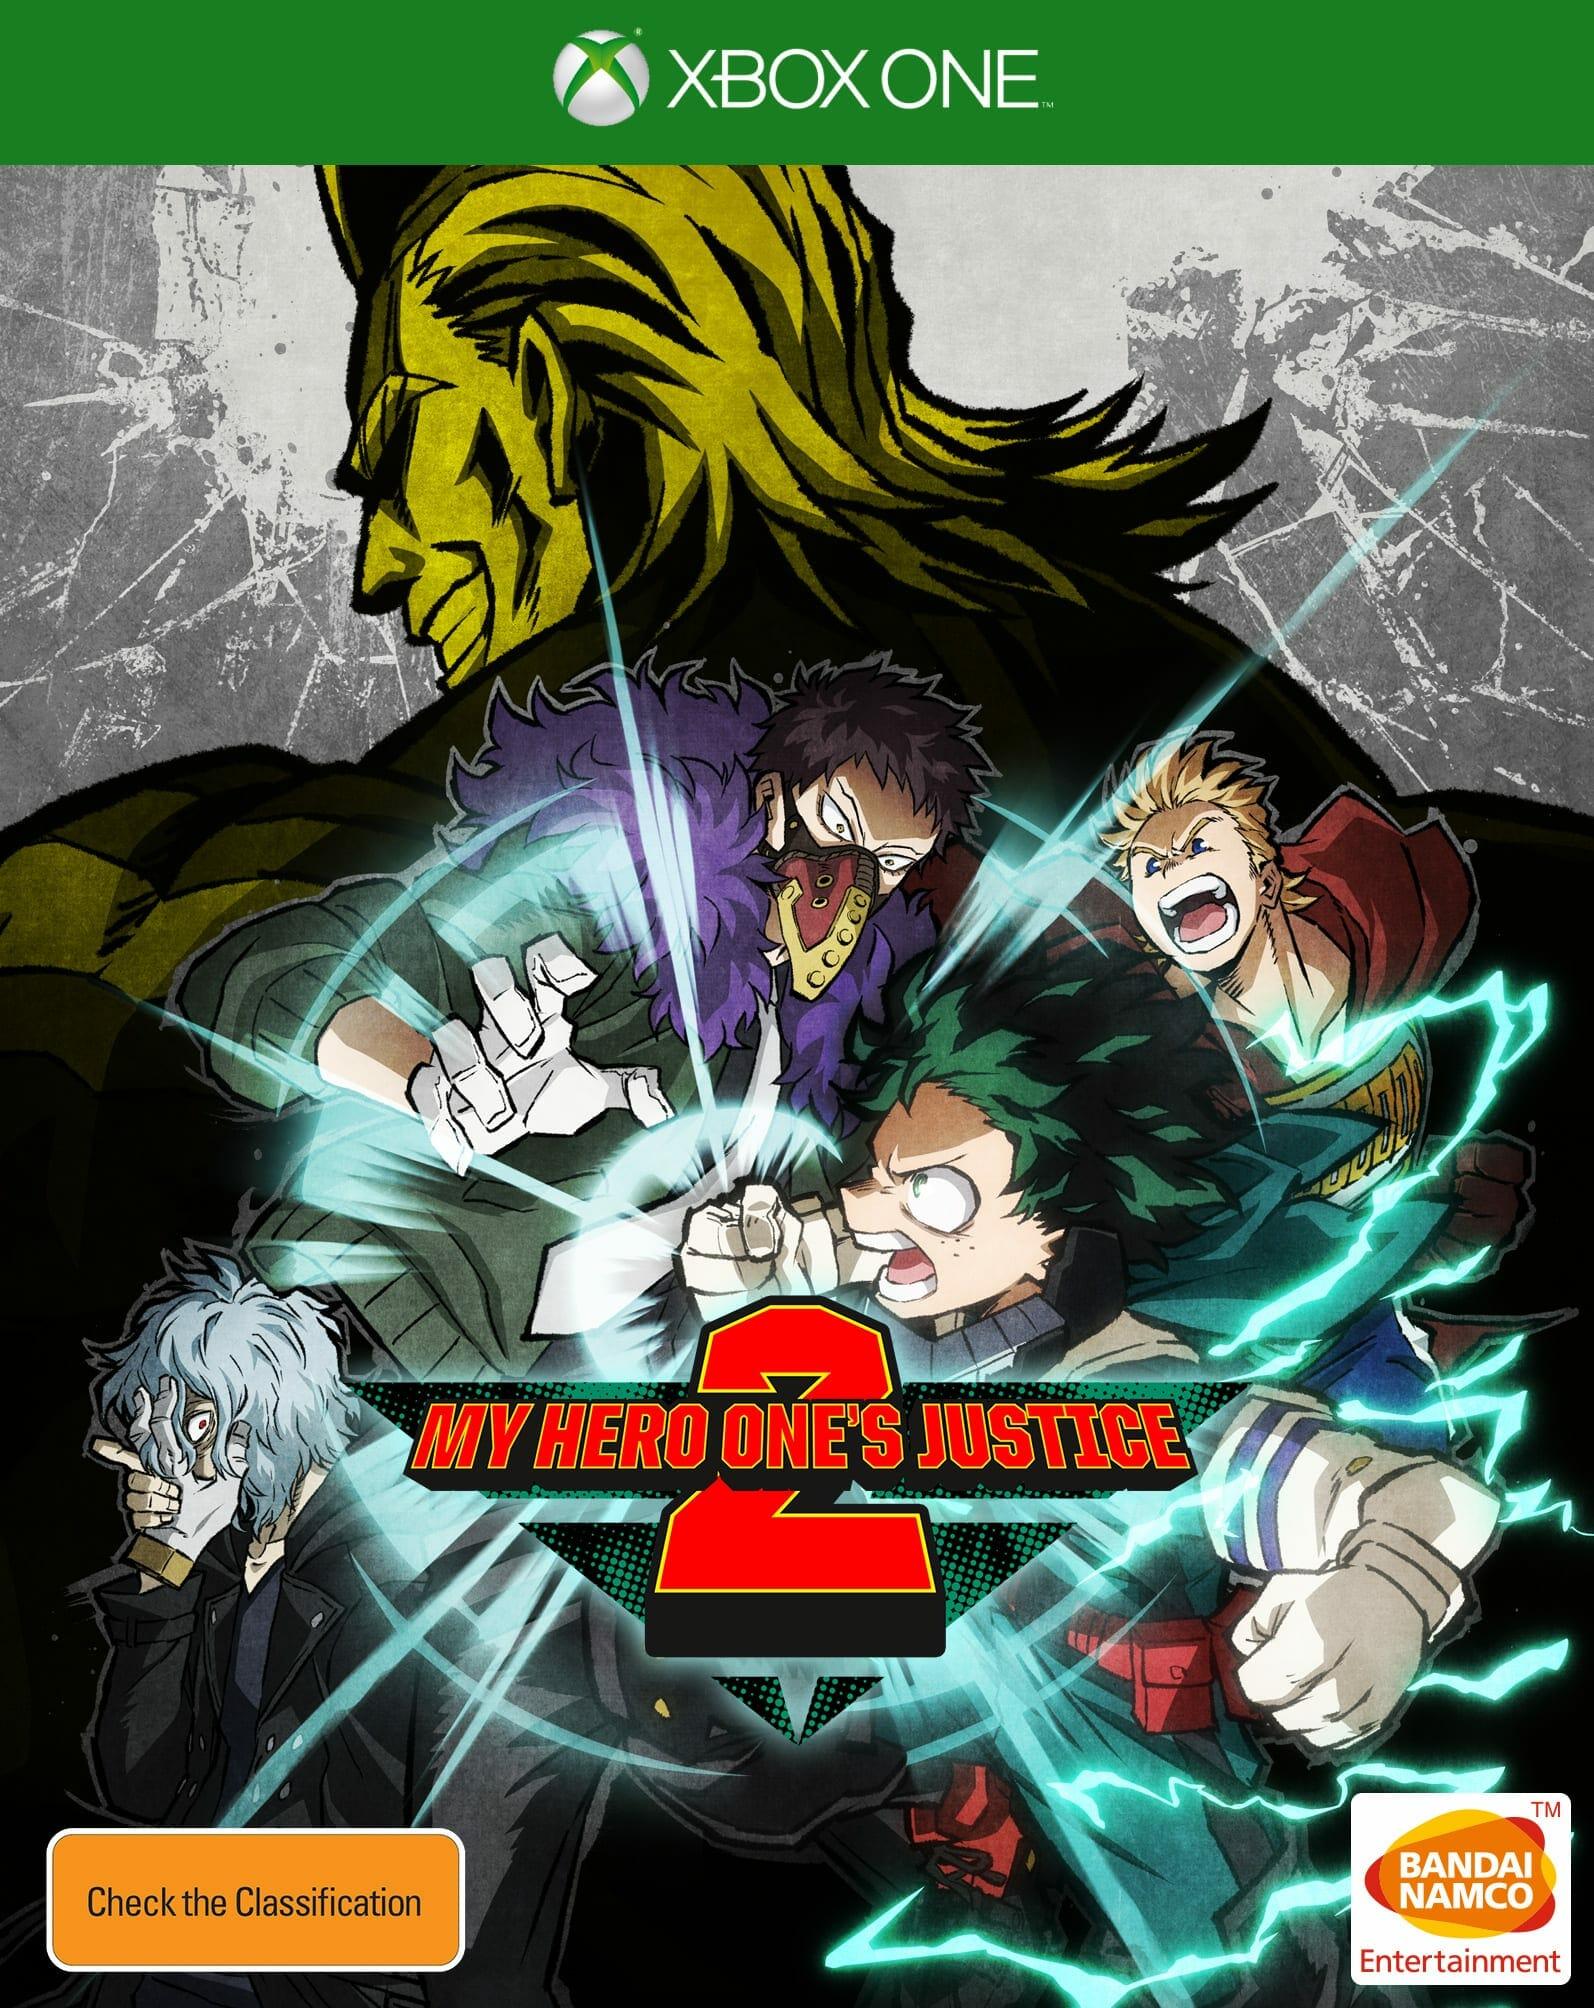 My Hero One's Justice 2 Gameplay